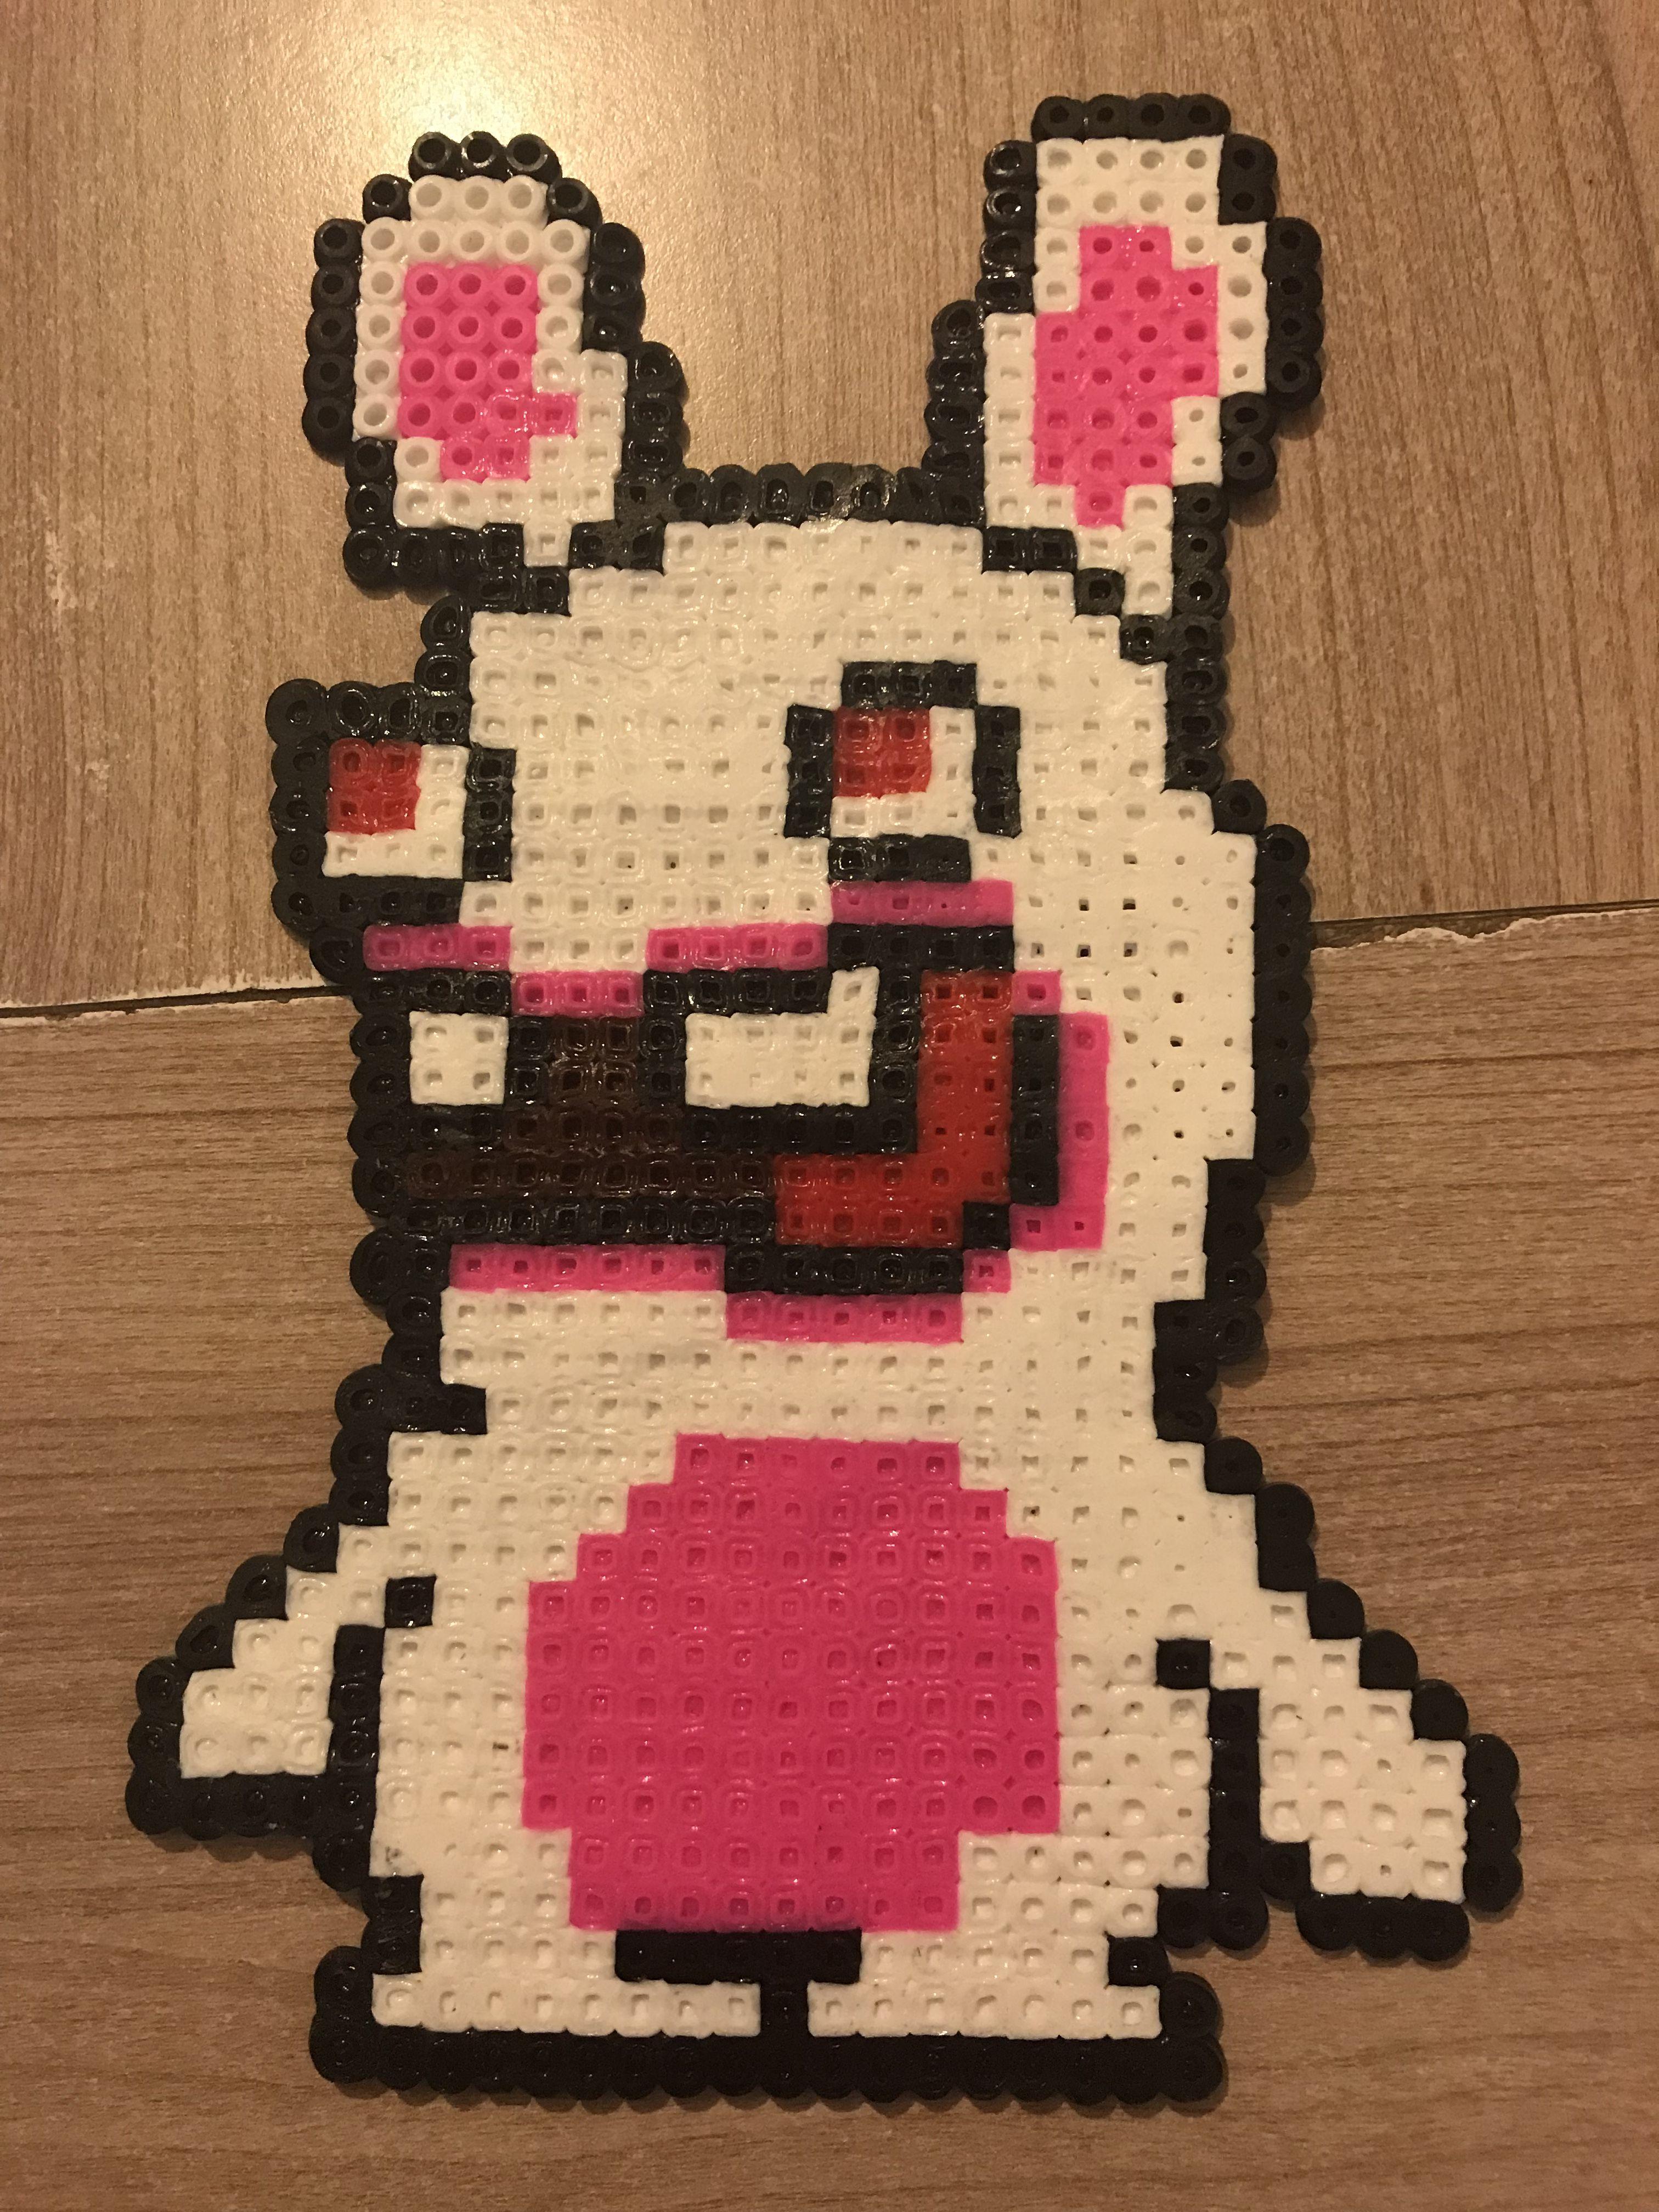 Lapin Cretin Pixel Art Avec Images Pixel Art